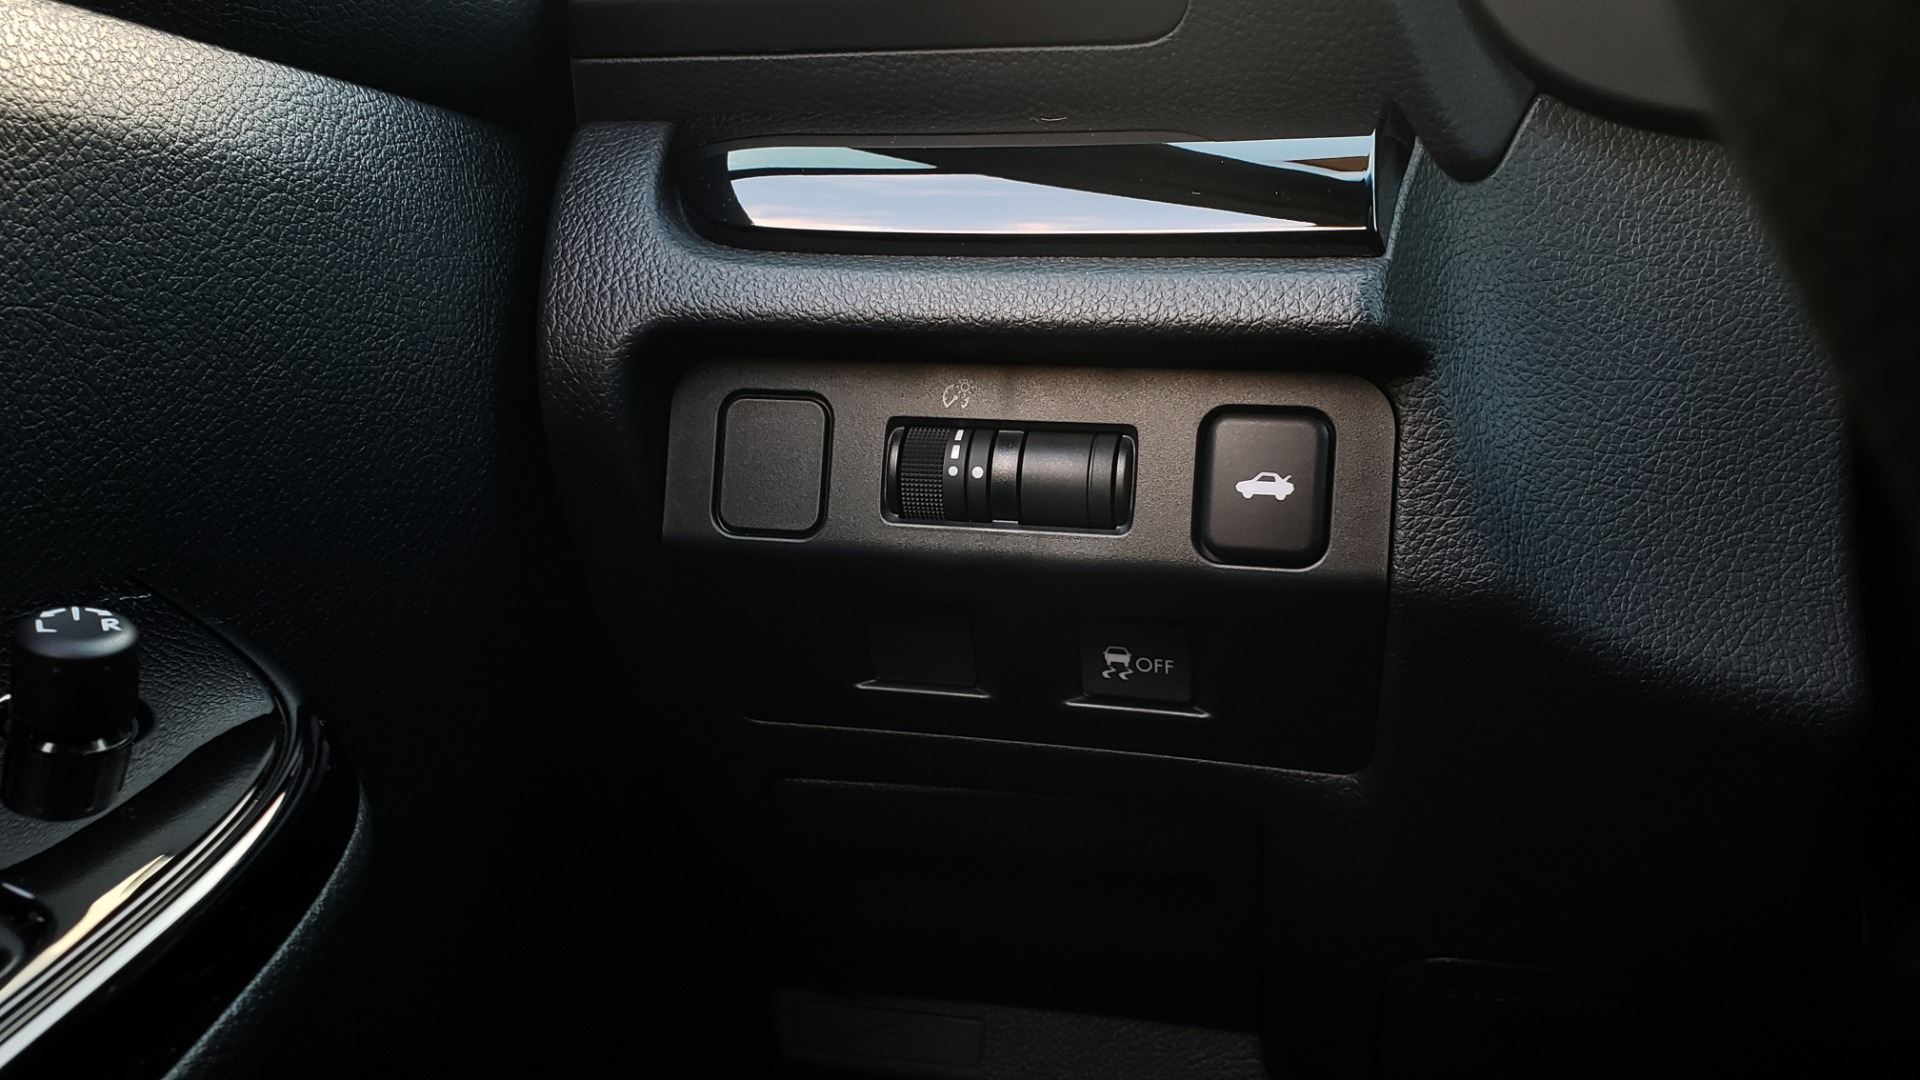 Used 2020 Subaru WRX STI 2.5L TURBO / 6-SPEED MANUAL / RECARO SEATS / REARVIEW for sale Sold at Formula Imports in Charlotte NC 28227 35